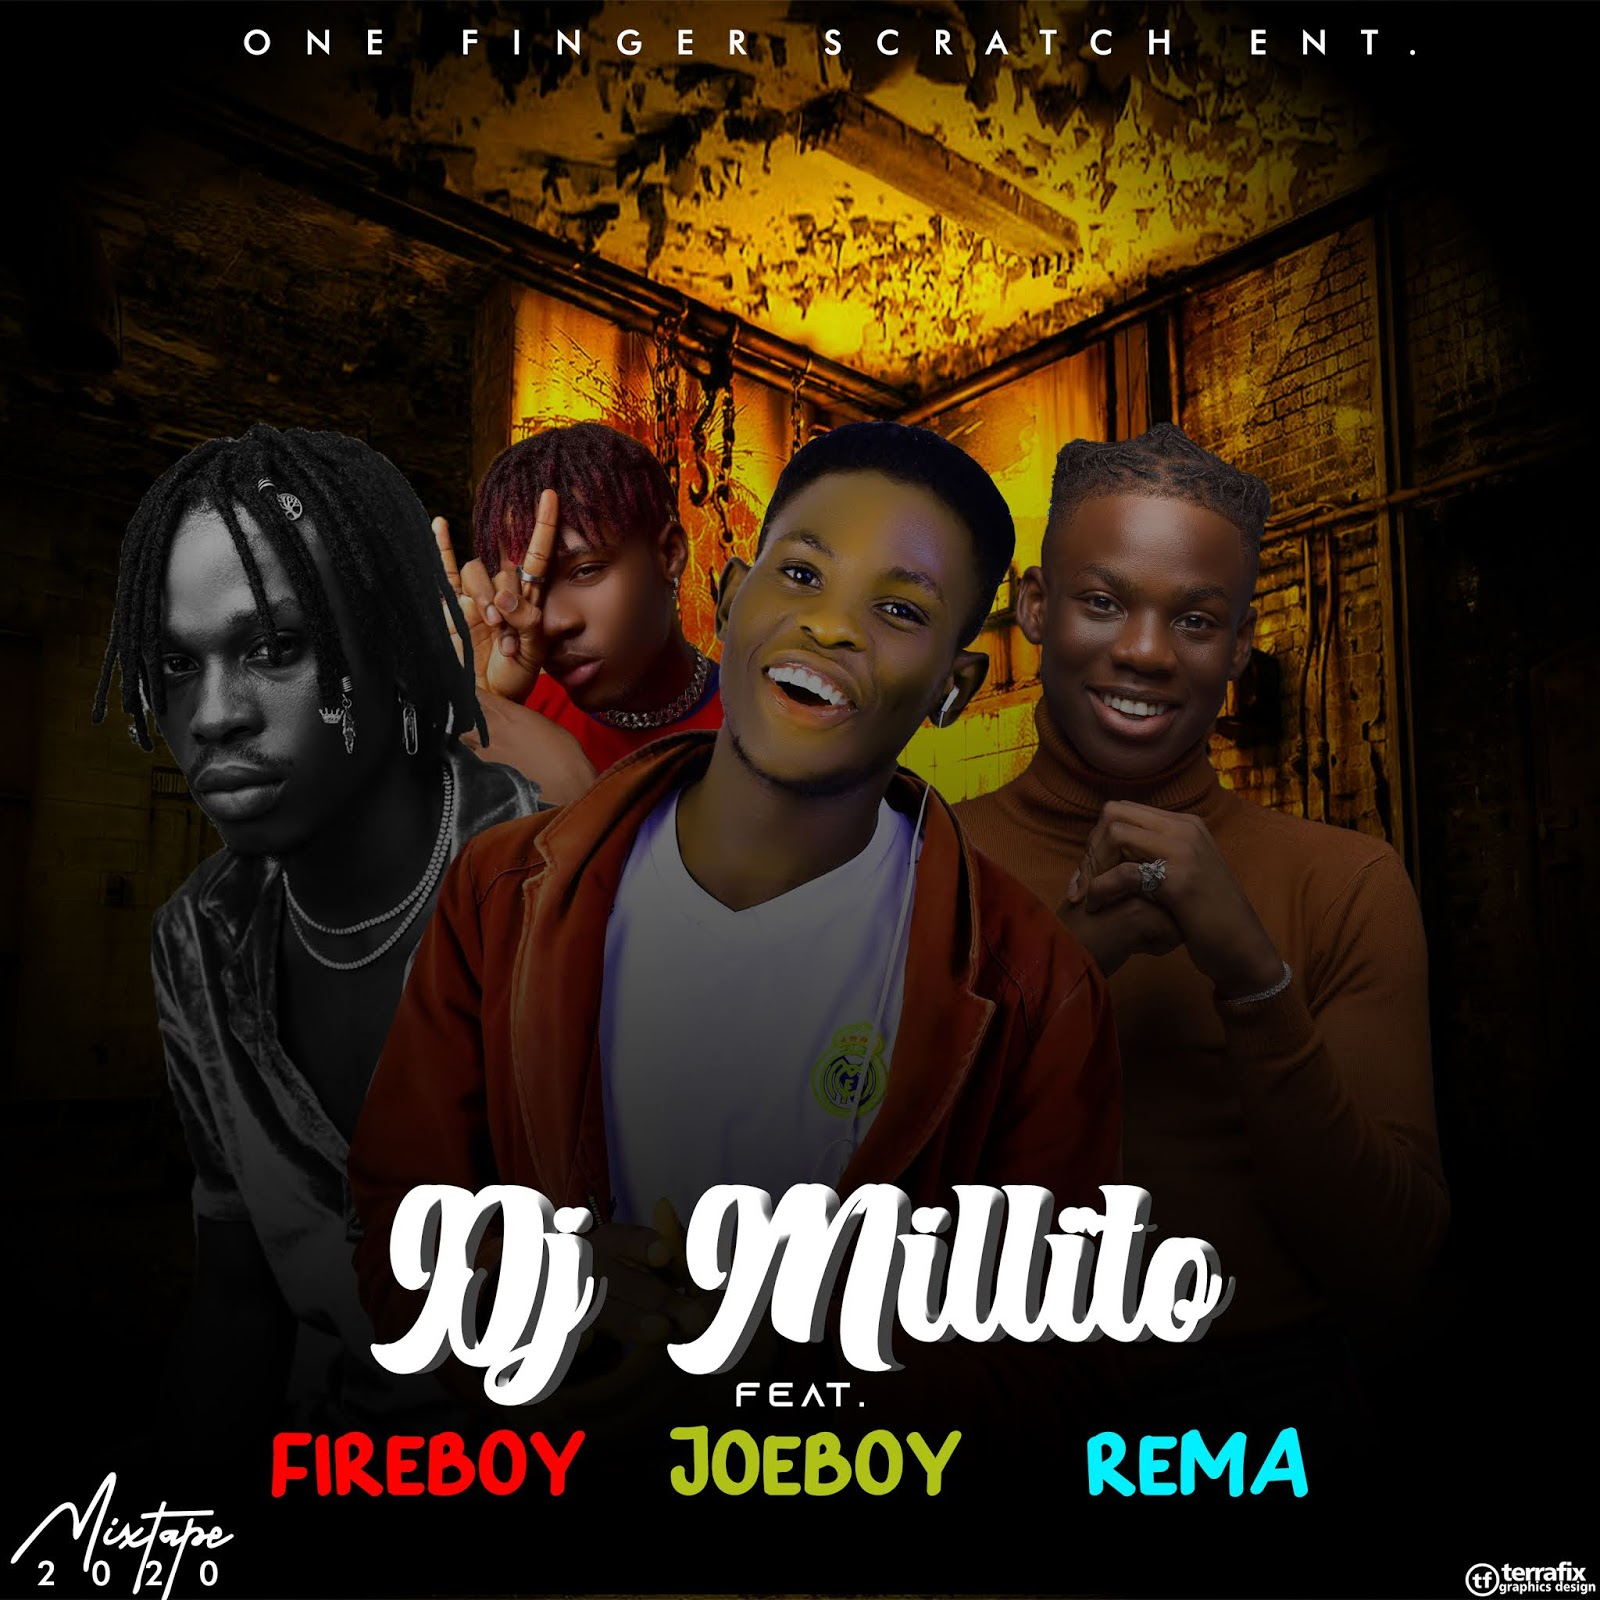 [MIXTAPE] DJ Milito - Fireboy X Joeboy X Rema Mixtape 2020   FAST DOWNLOAD